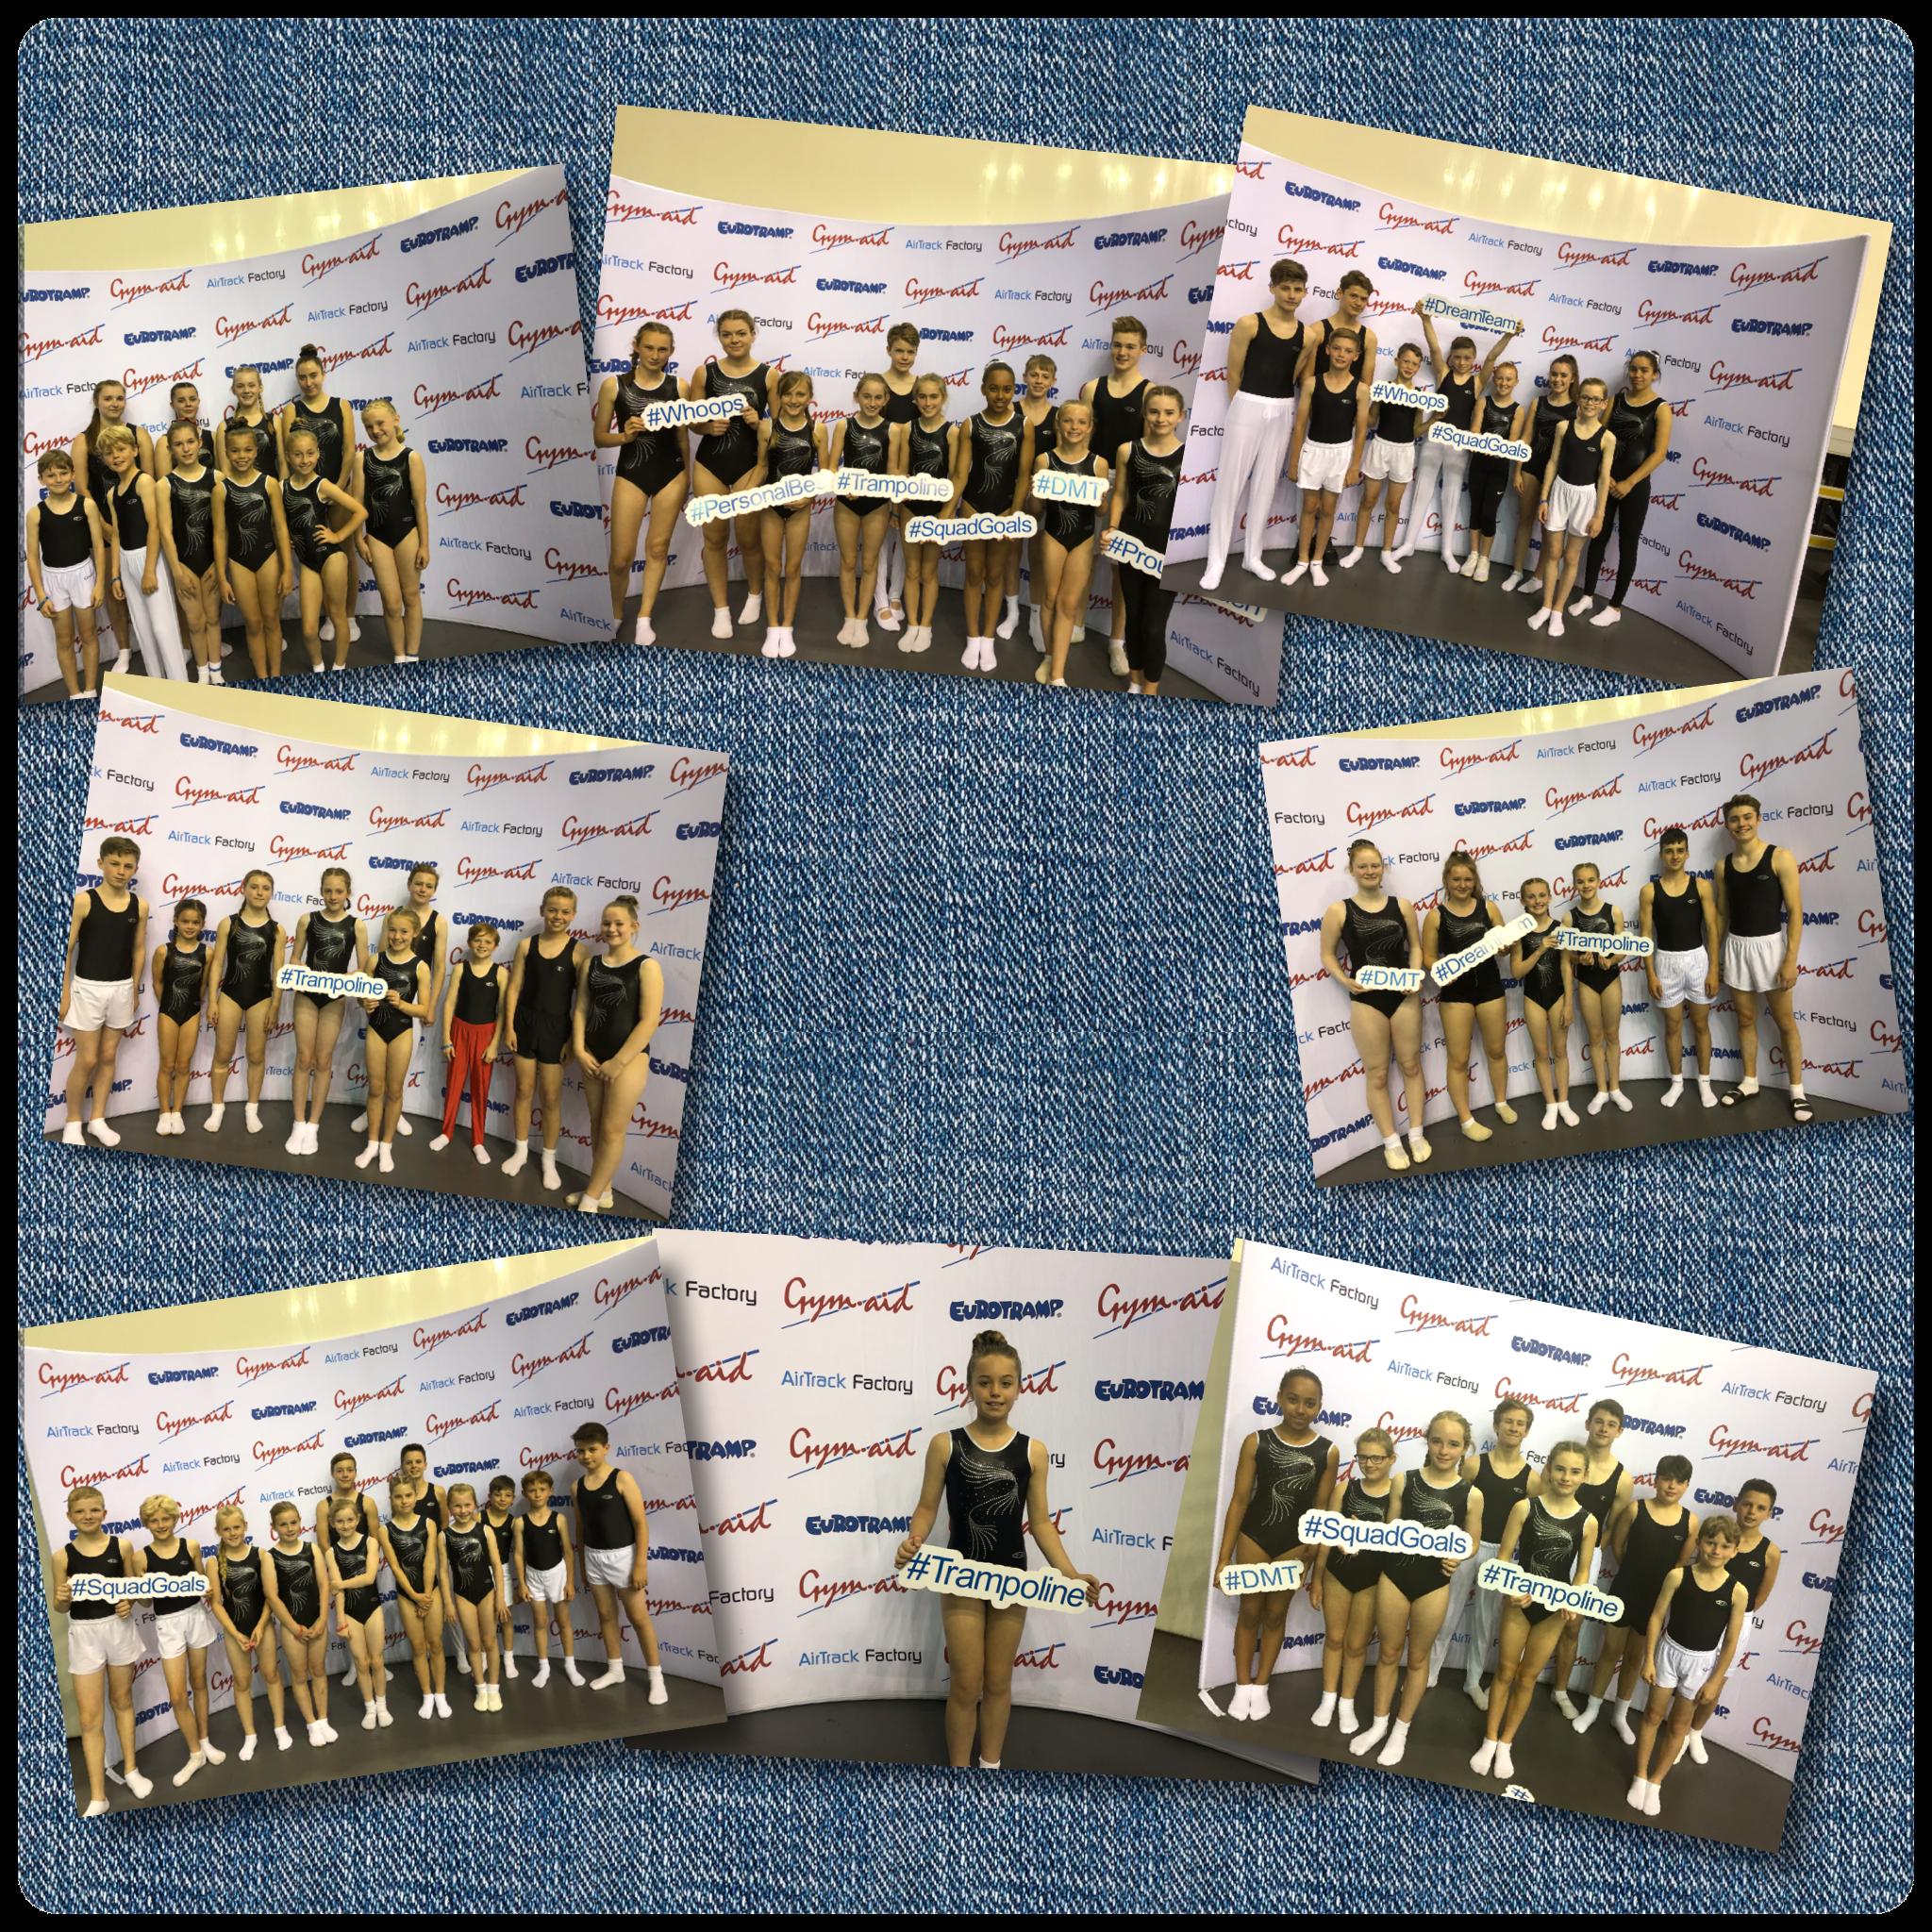 Team East competitors